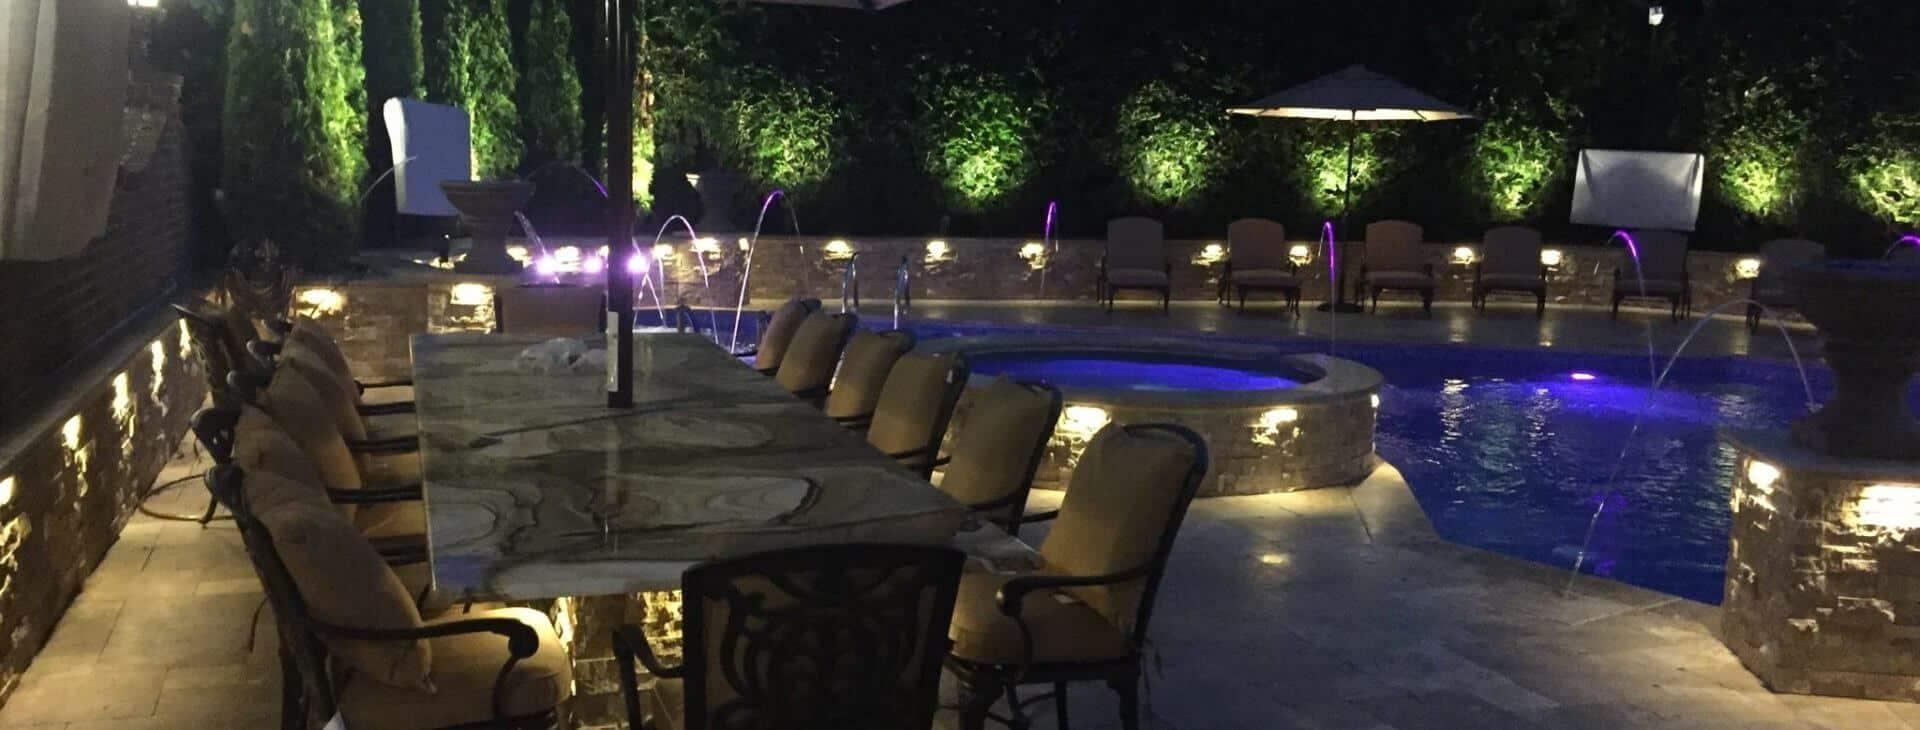 Pool Designers & Patio Builders